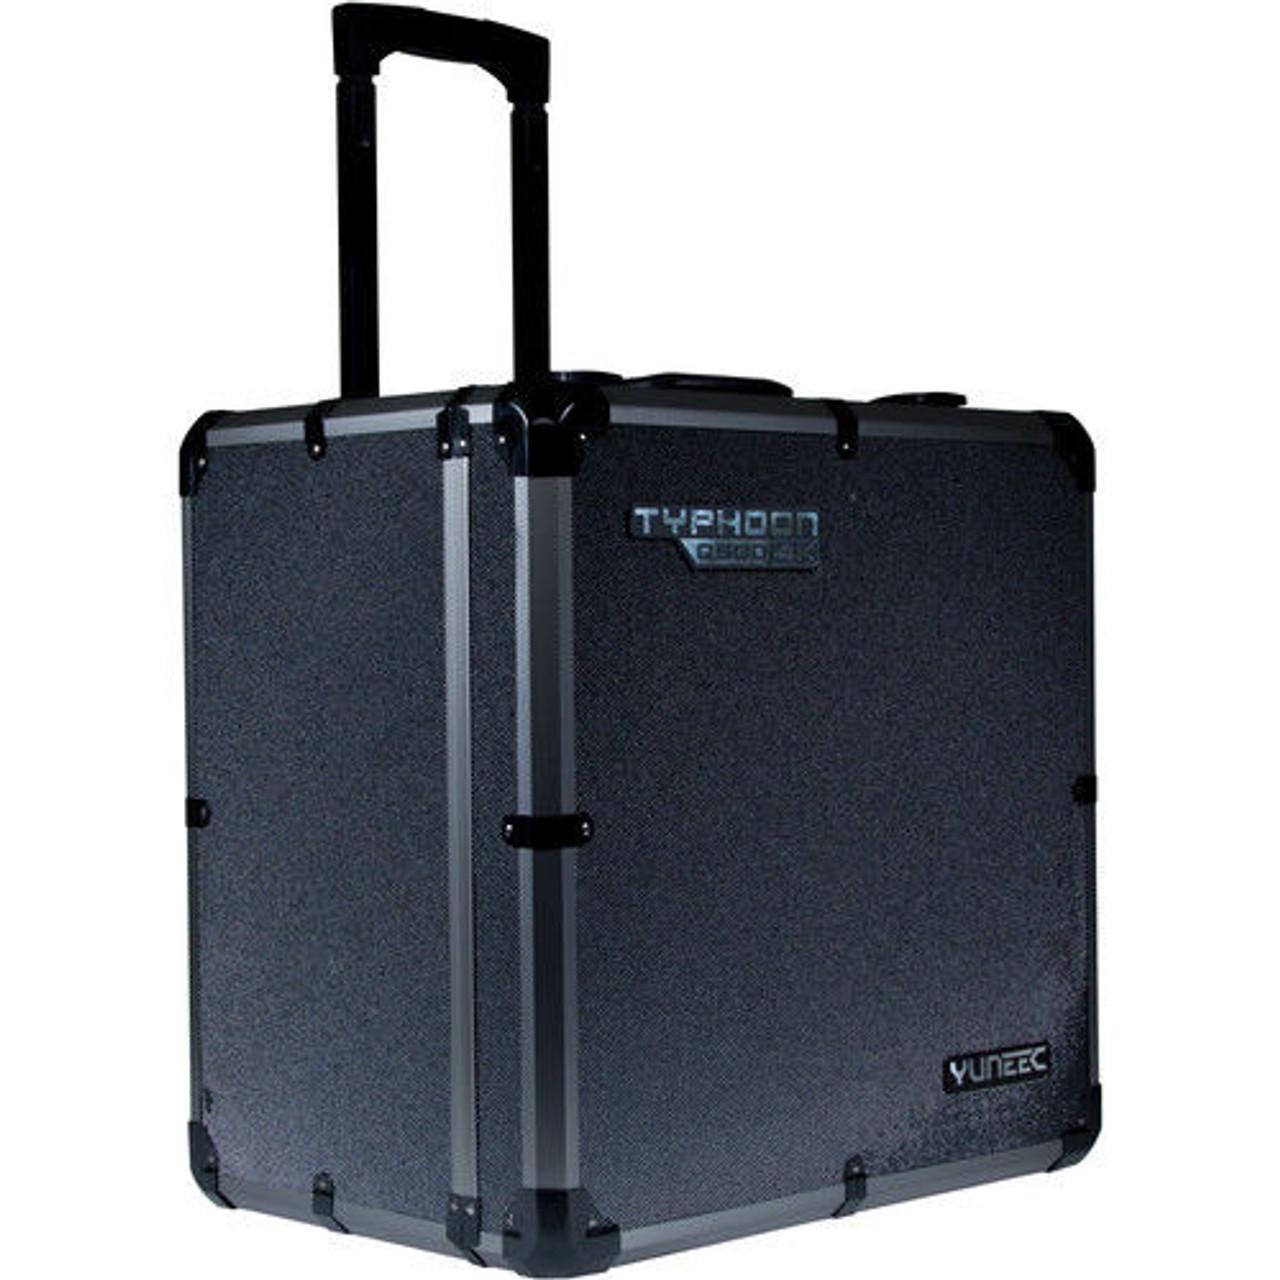 YUNEEC Aluminum Case,Trolley Handle,4K Typhoon Quad,YUNQ4KTA102 NEW